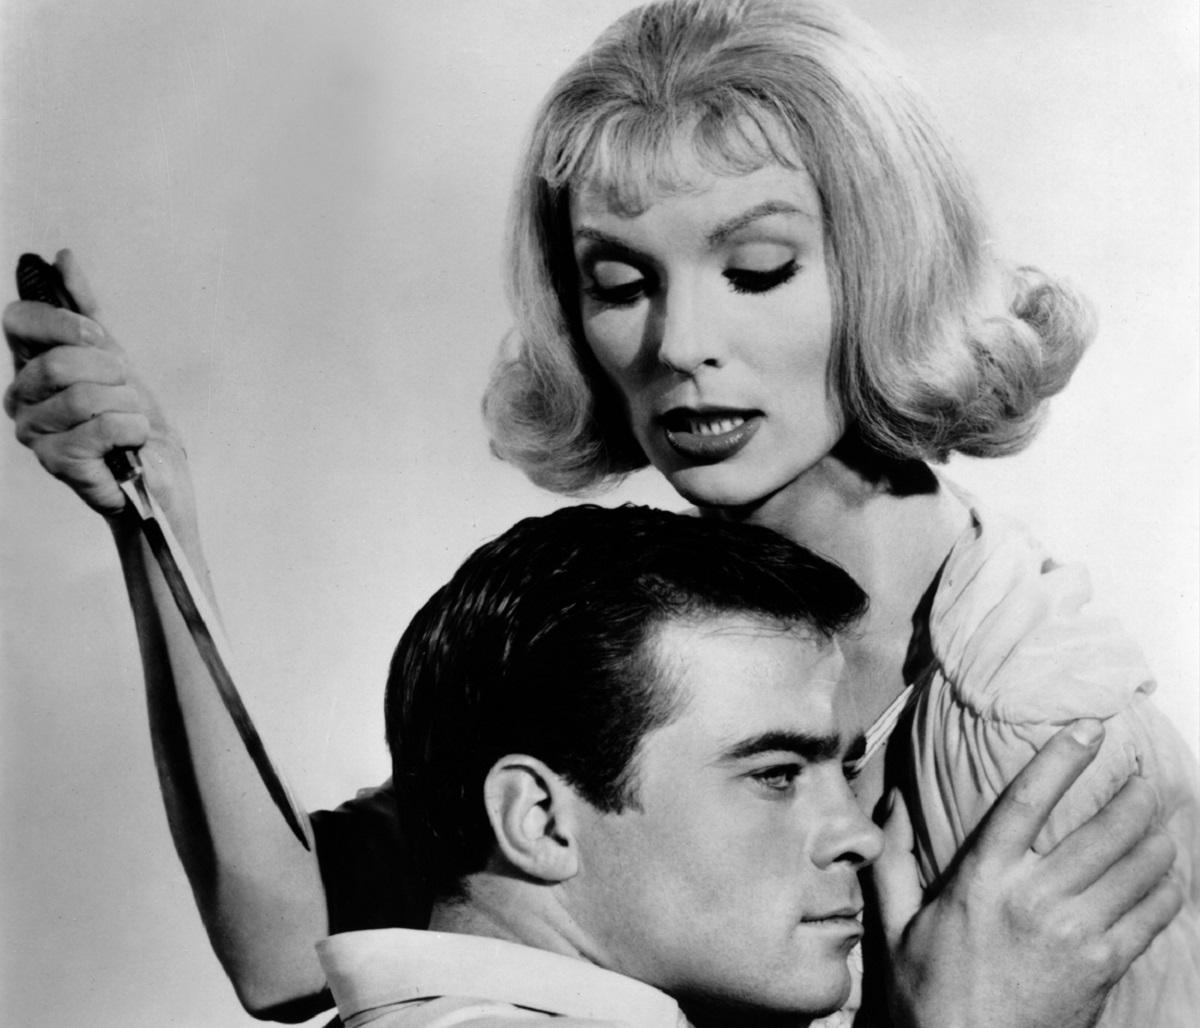 Glenn Corbett and Jean Arless in Homicidal (1961)